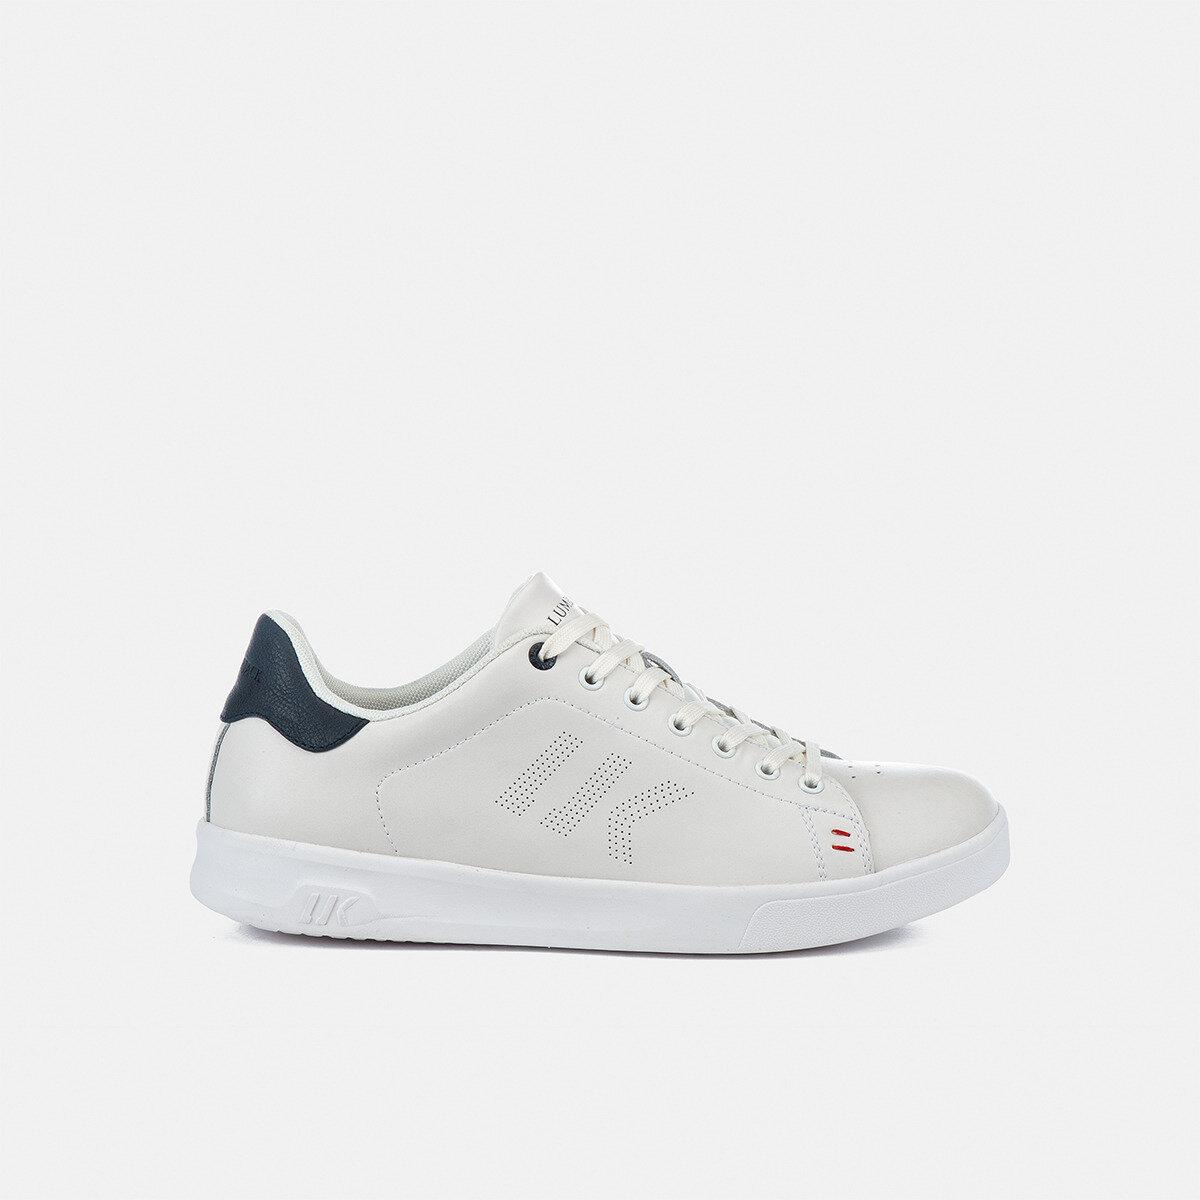 HAWK WHITE/NAVY BLUE Man Sneakers